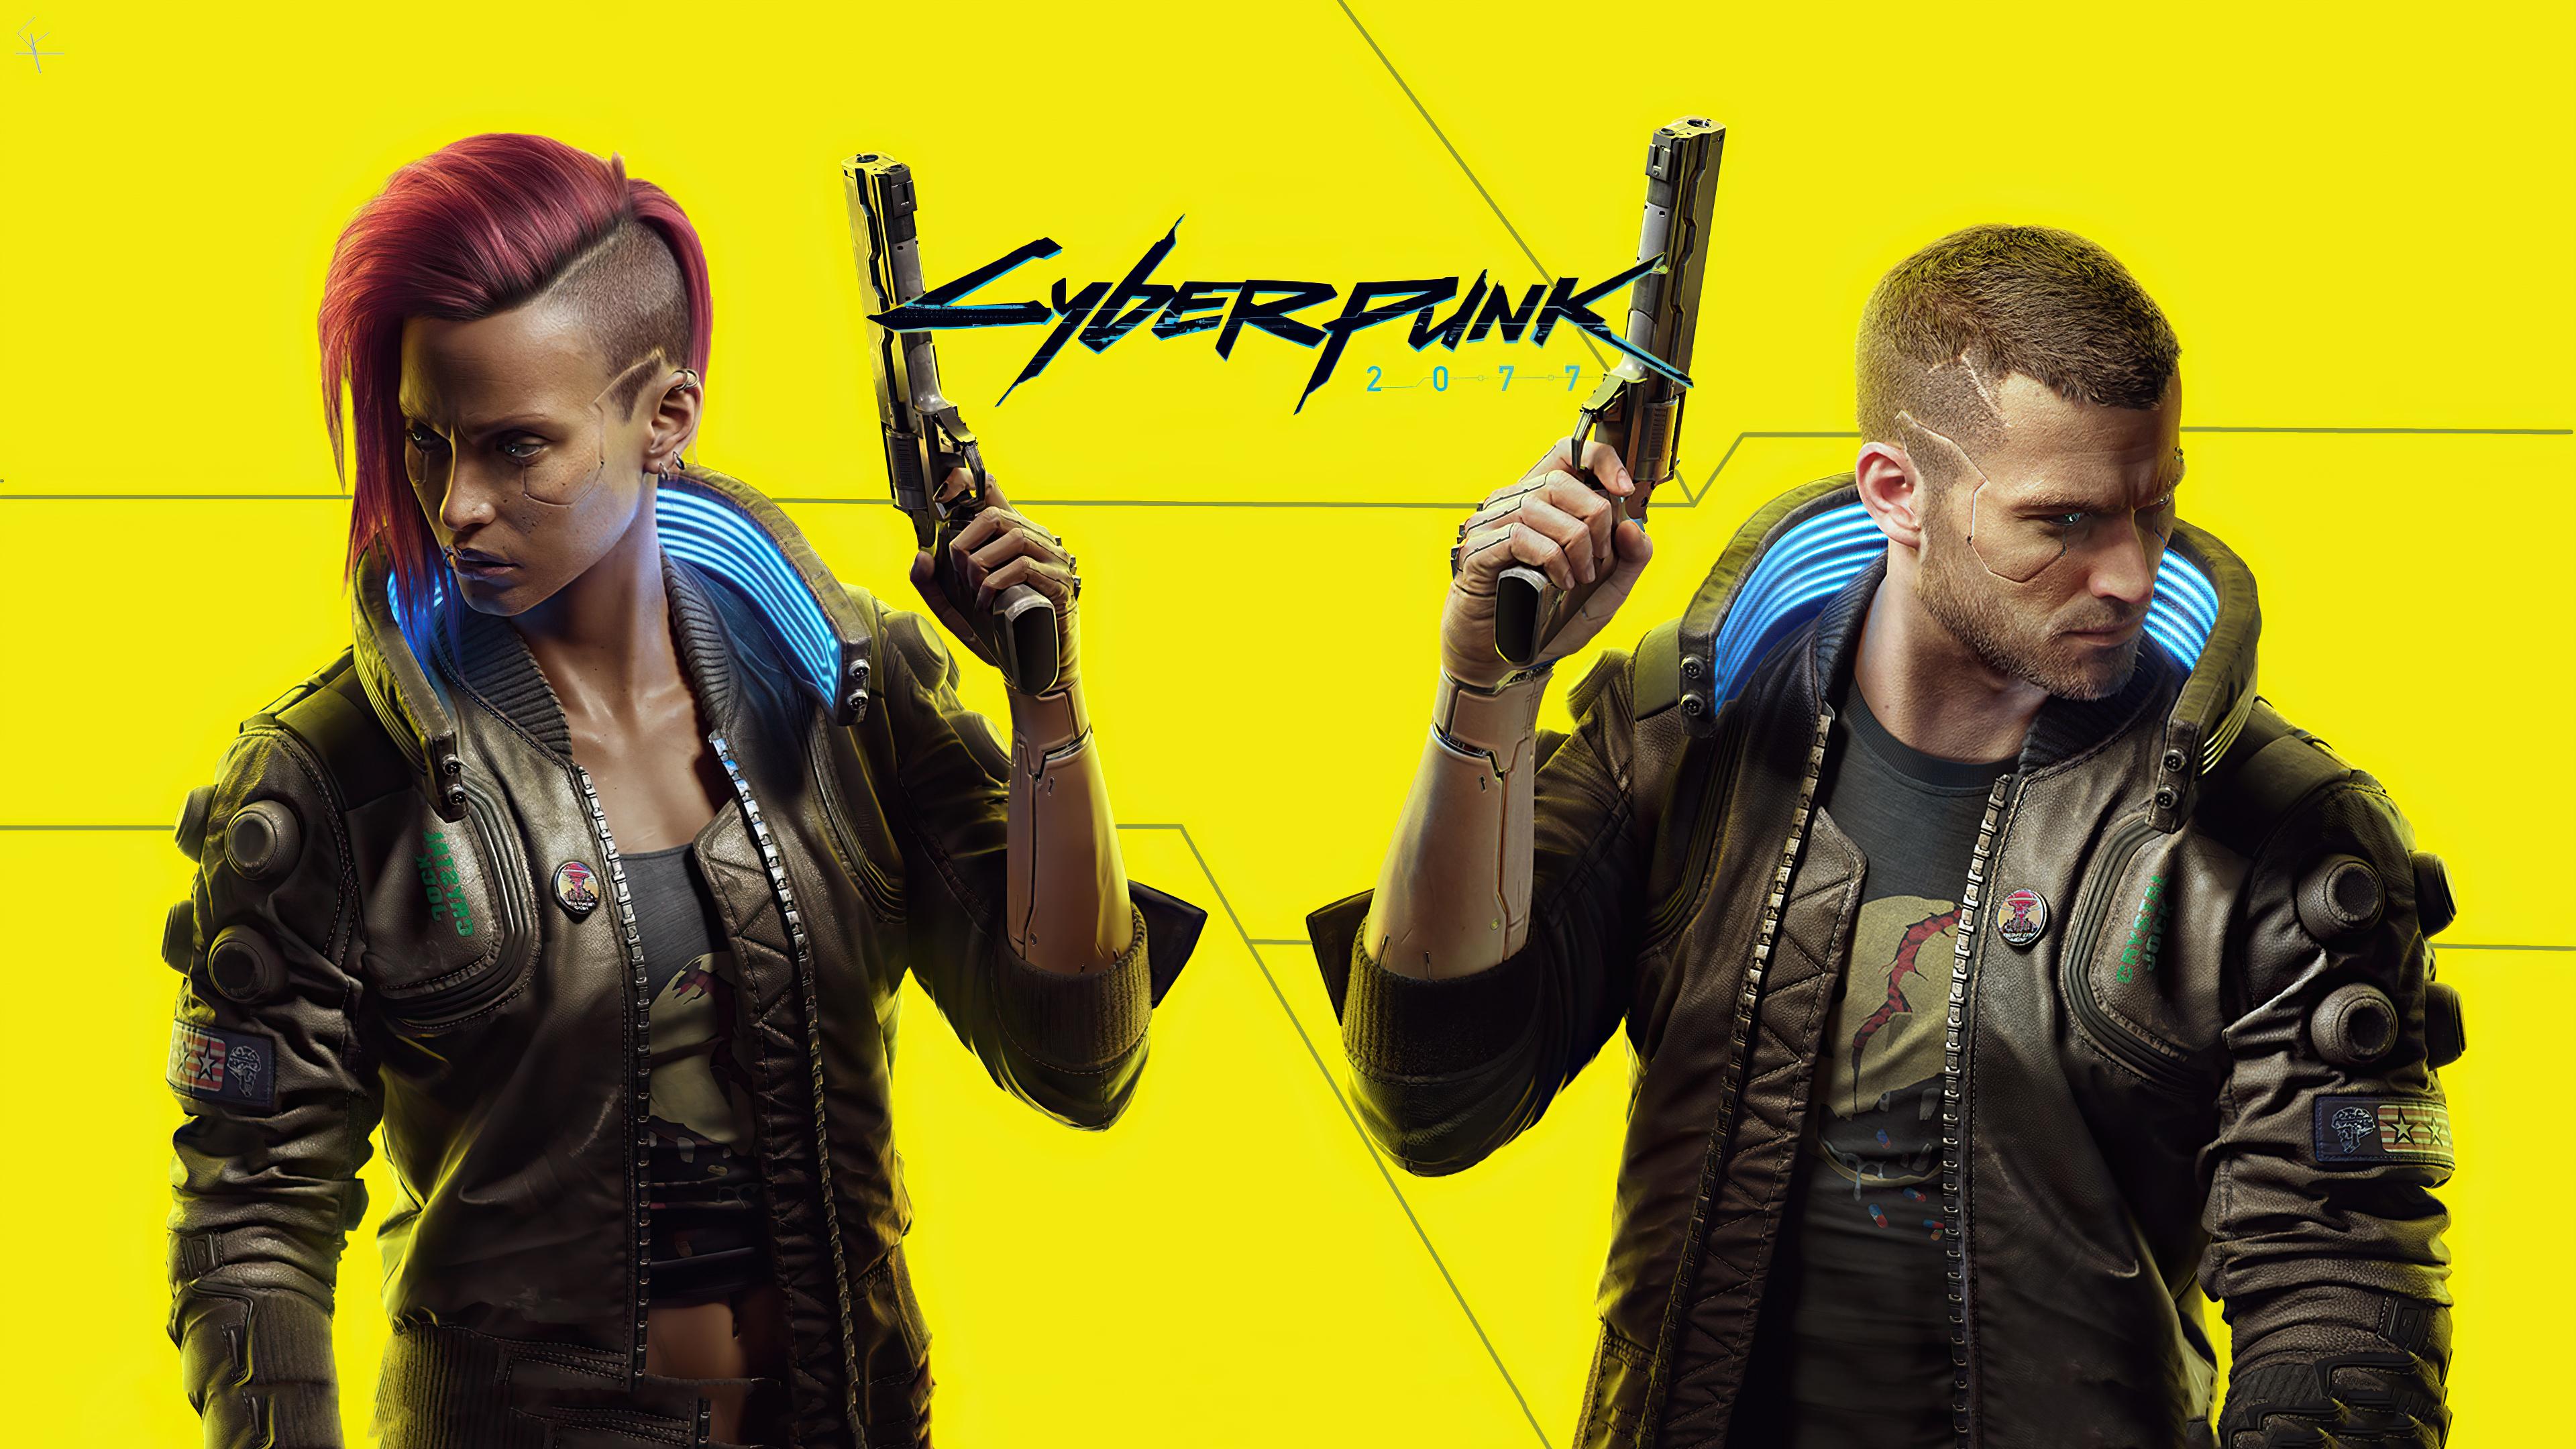 Cyberpunk 2077 2020 4k Game, HD Games, 4k Wallpapers ...